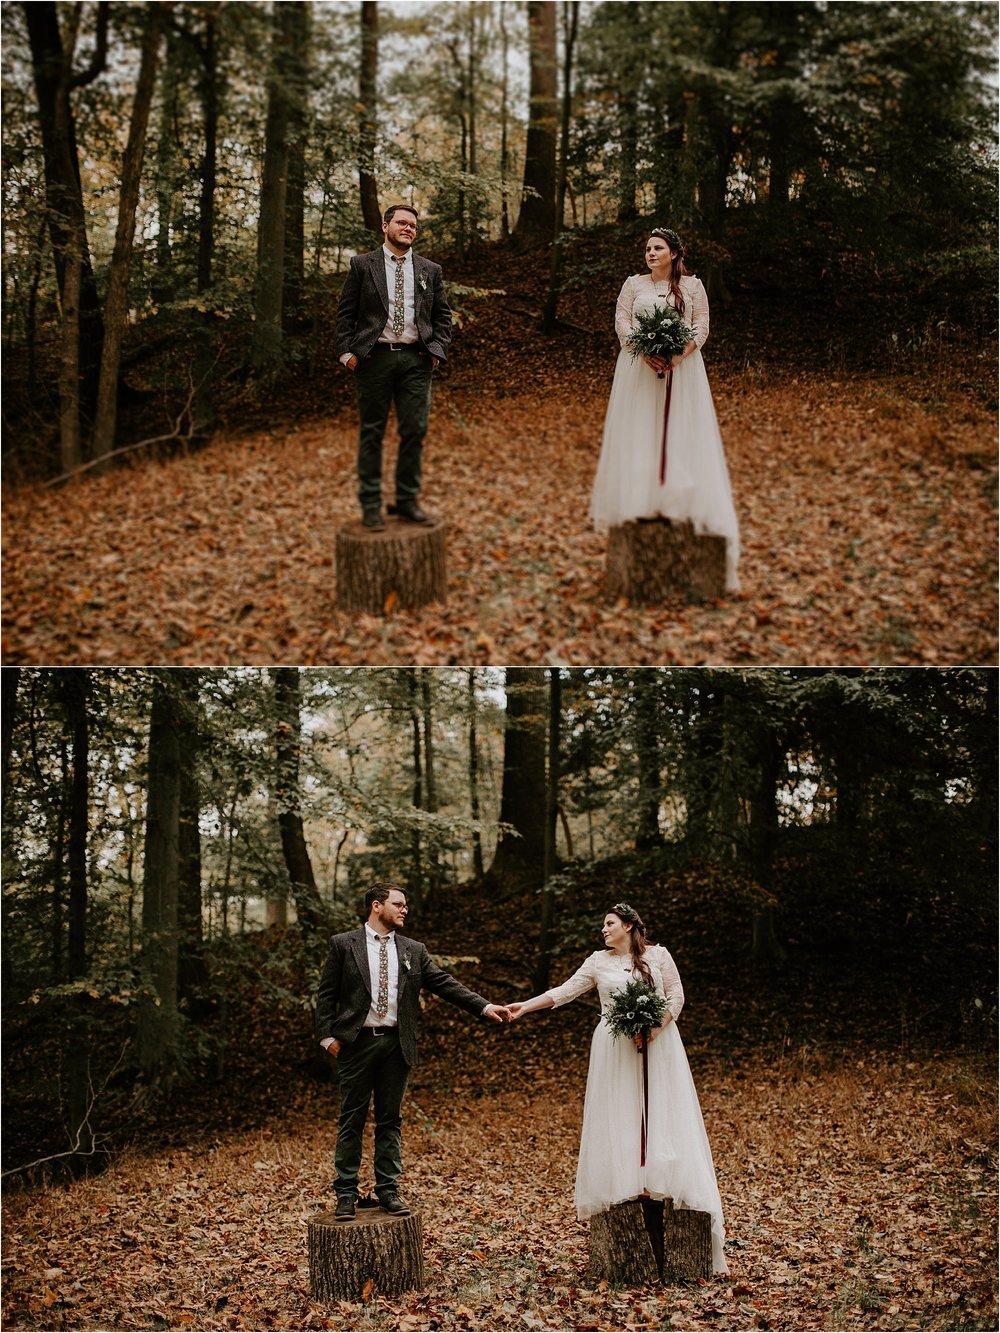 Sarah_Brookhart_Baltimore_Wedding_Photographer_0049.jpg